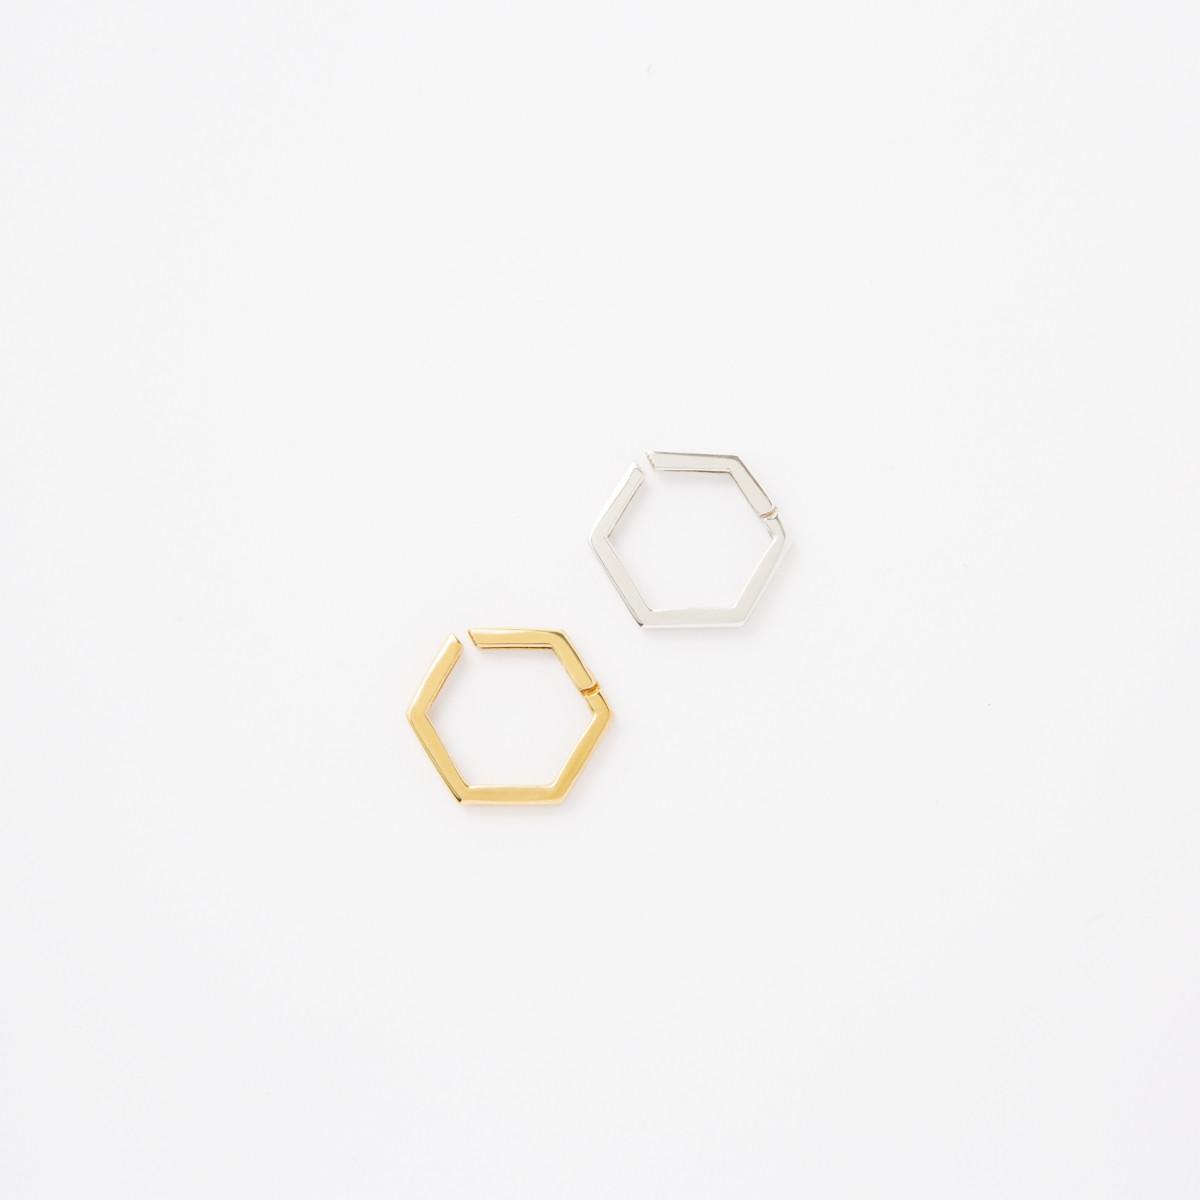 迚ゥ謦ョ繧頑怙邨・Hexagon